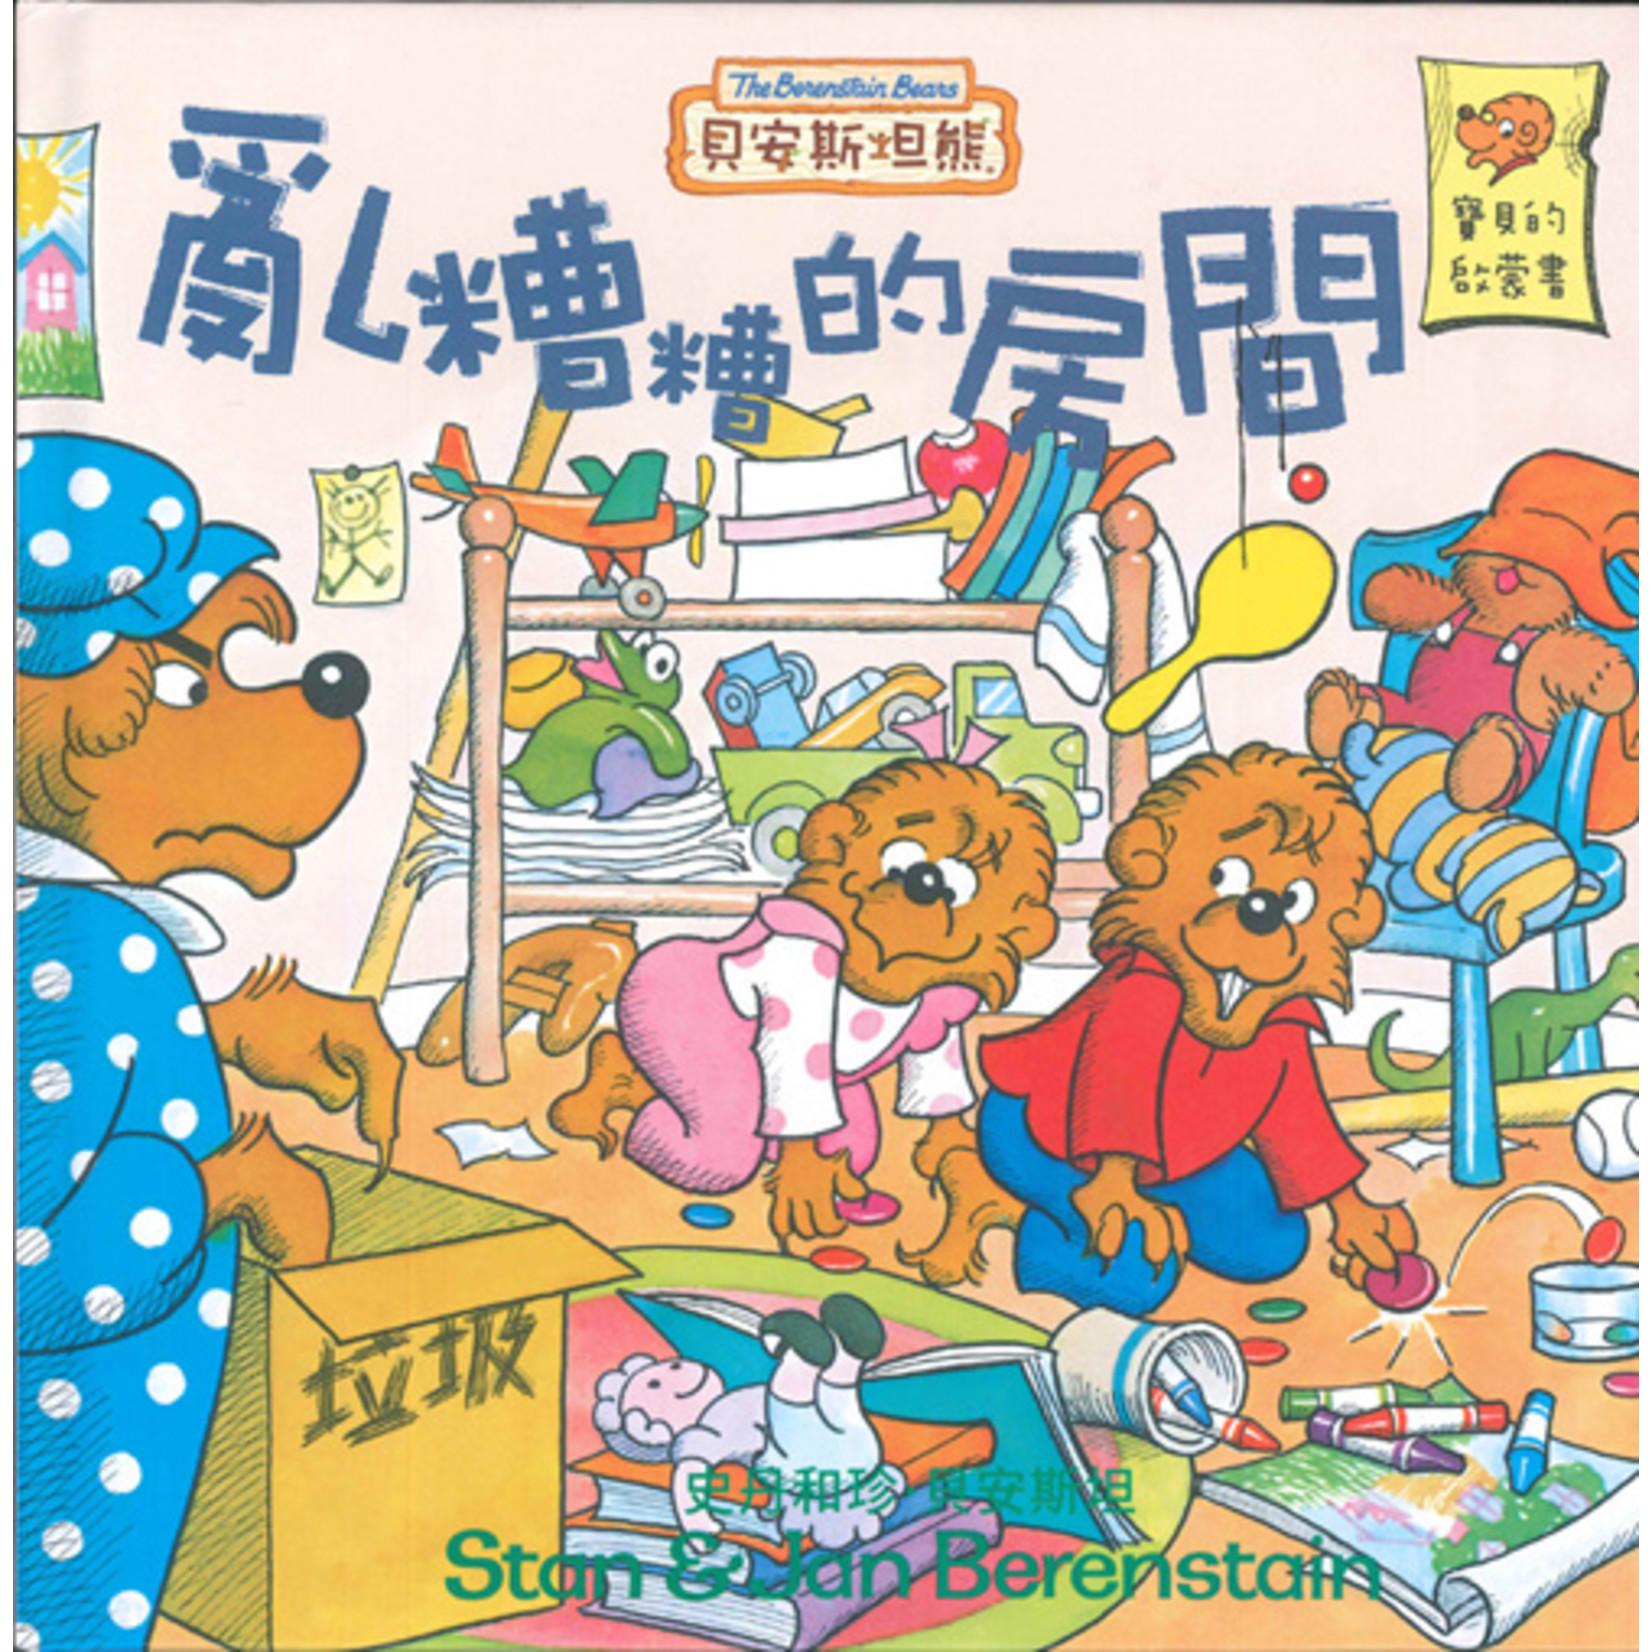 生命樹 Life Tree Global 貝安斯坦熊系列04:亂糟糟的房間 The Berenstain Bears 04: Messy Room